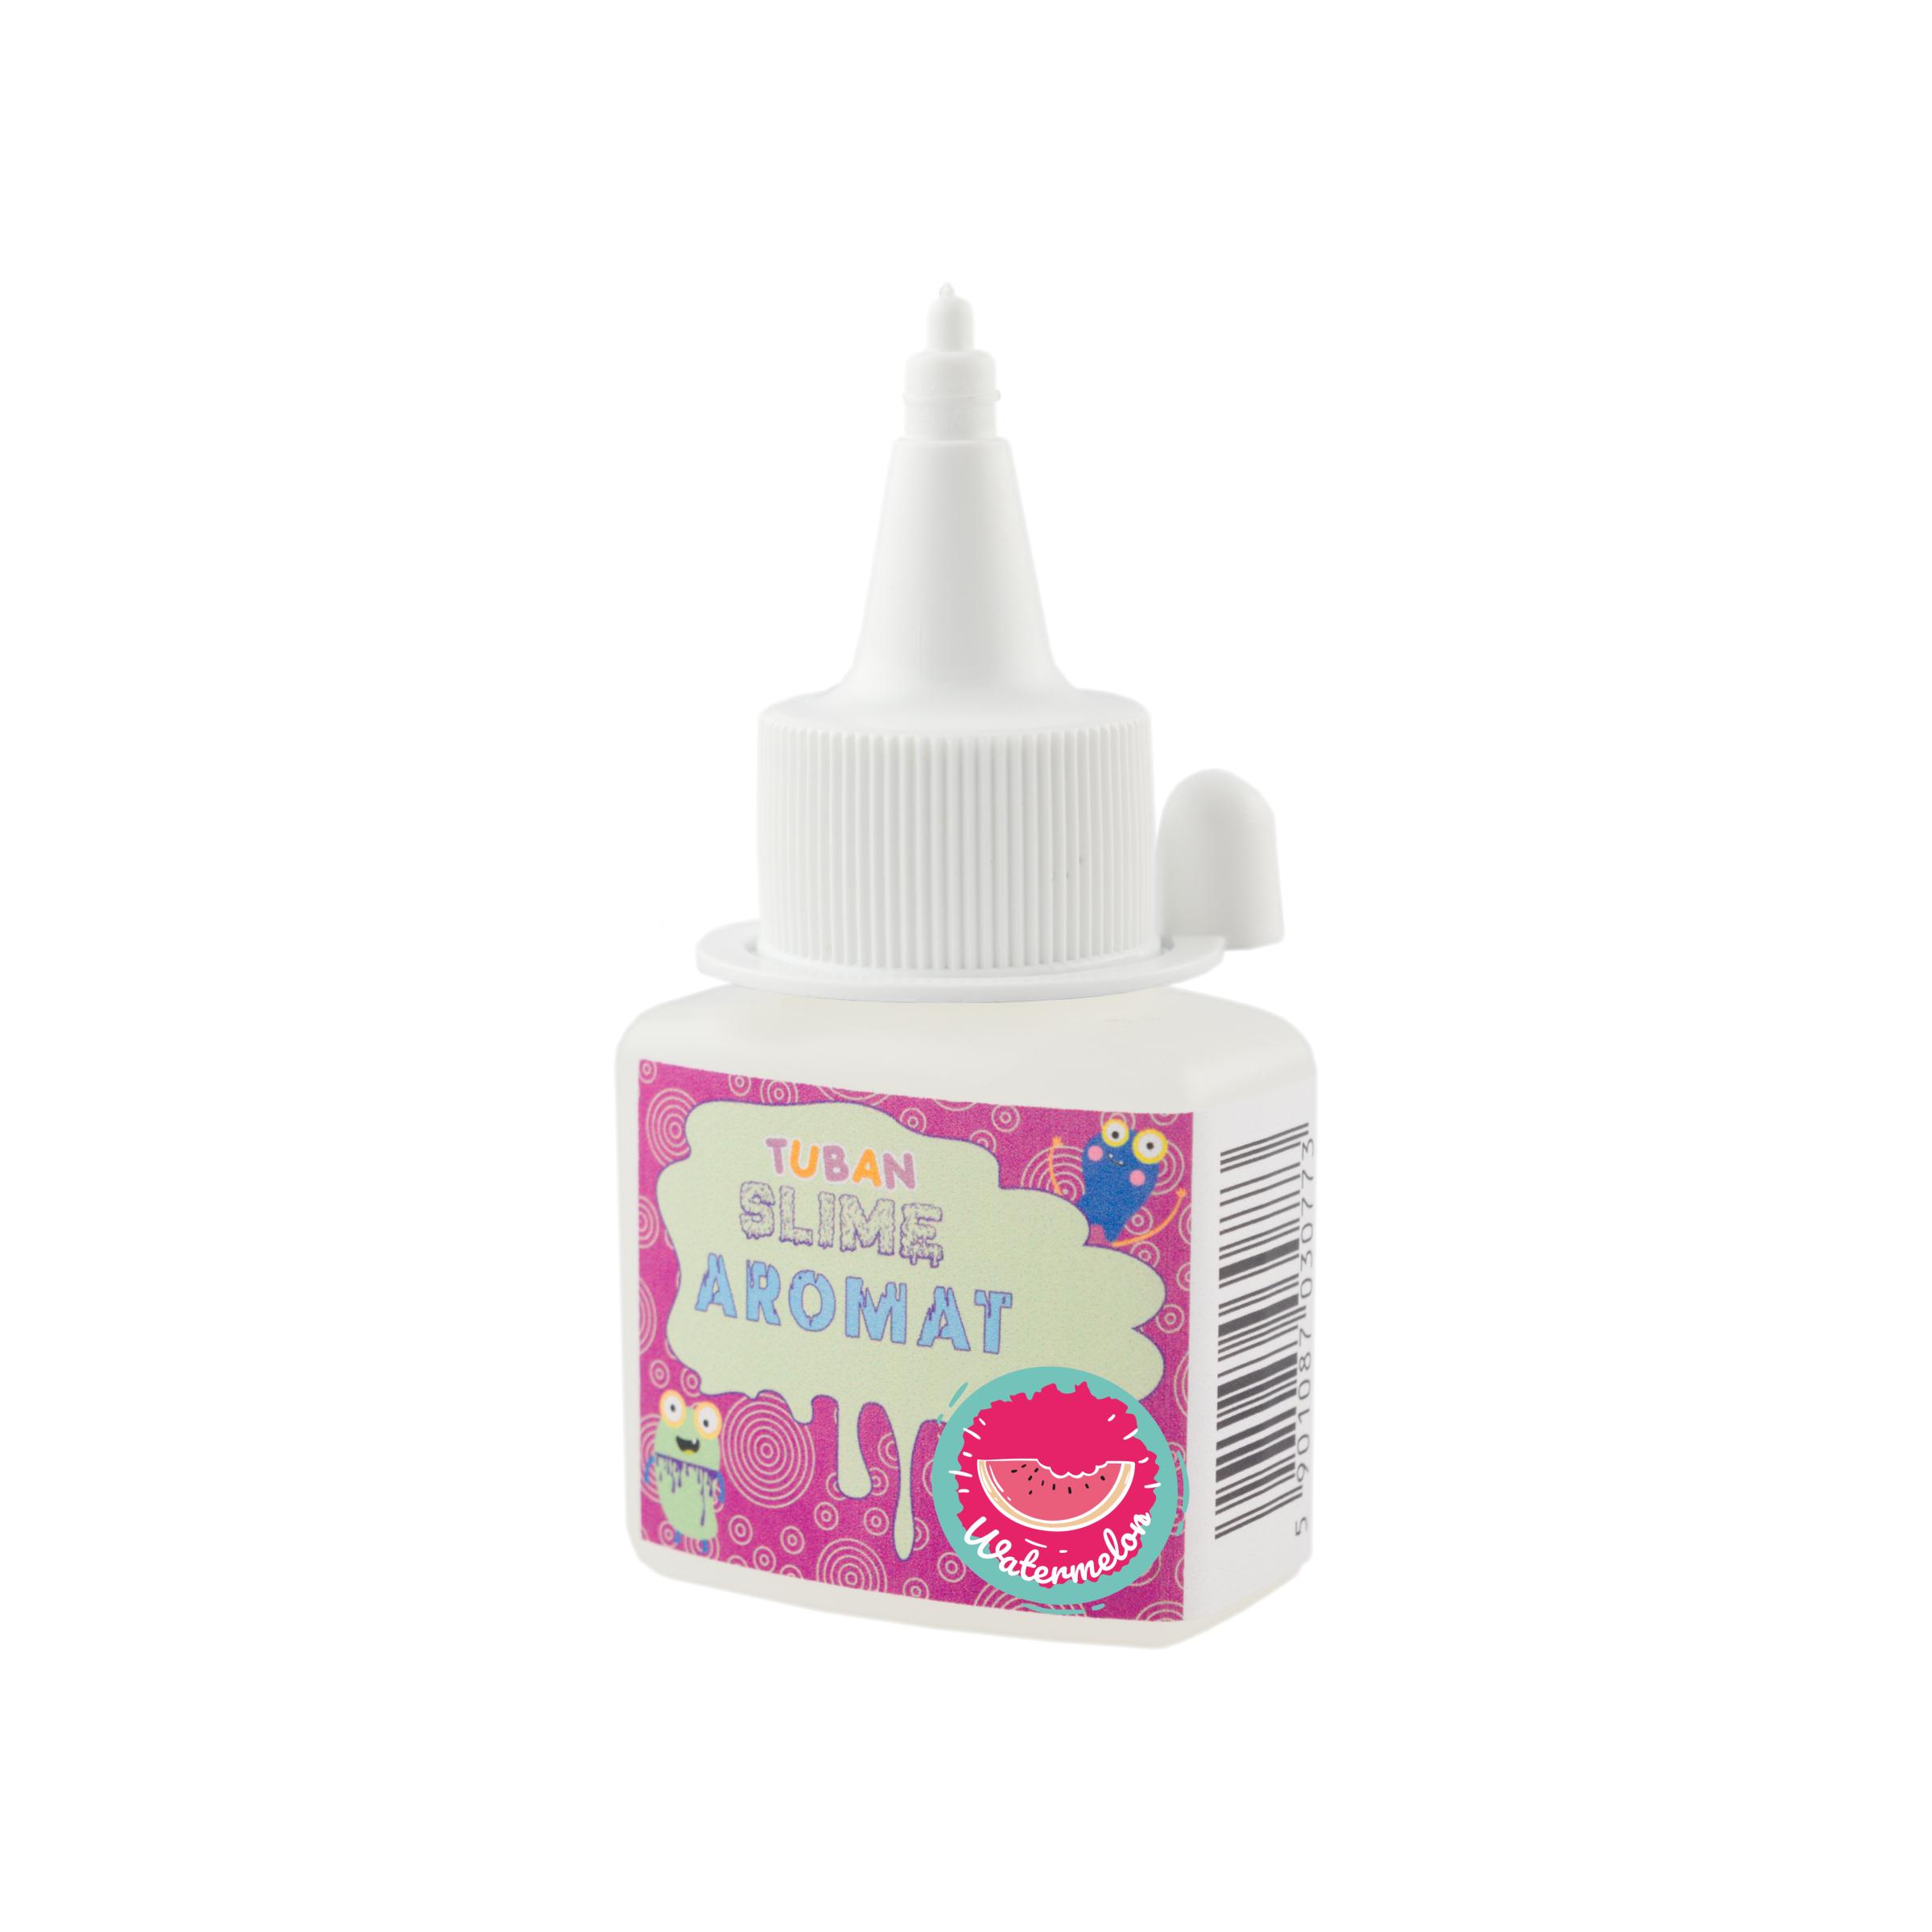 Tuban - Super Slime - Aroma mit Wassermelonenduft - 35 ml - by Jablka